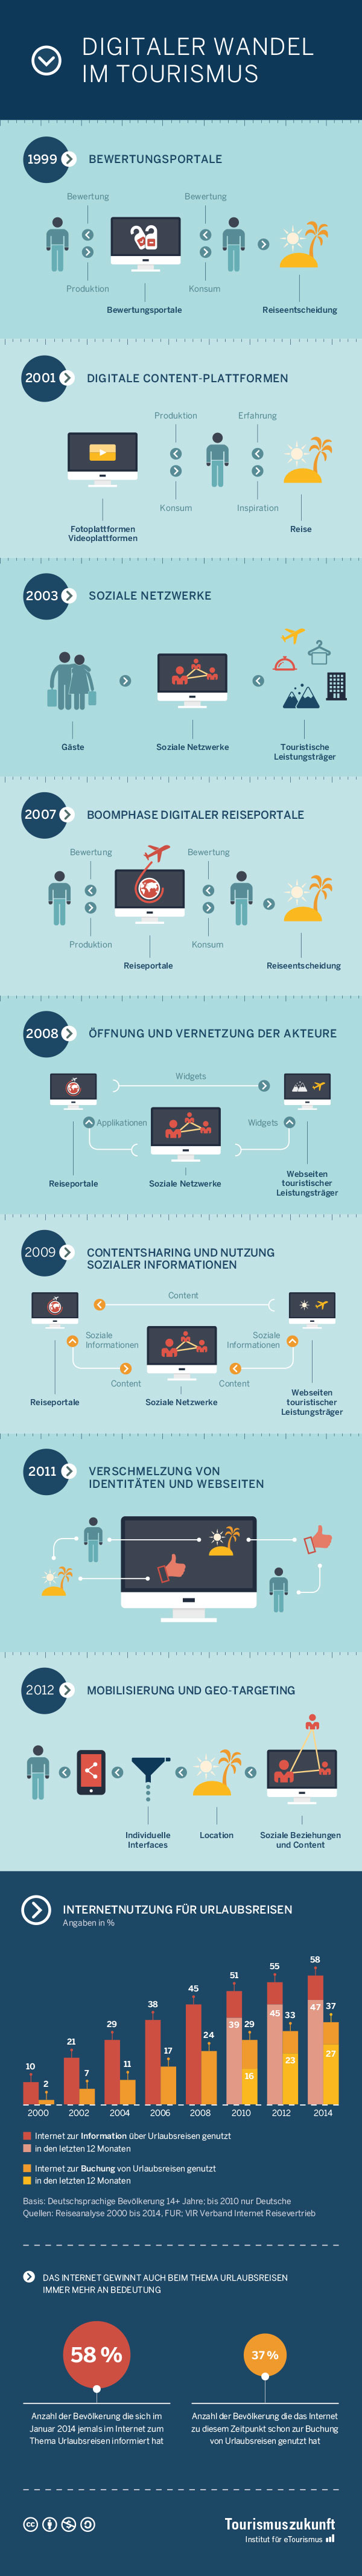 2802-WEB-TZ-Infografik-Fachartikel